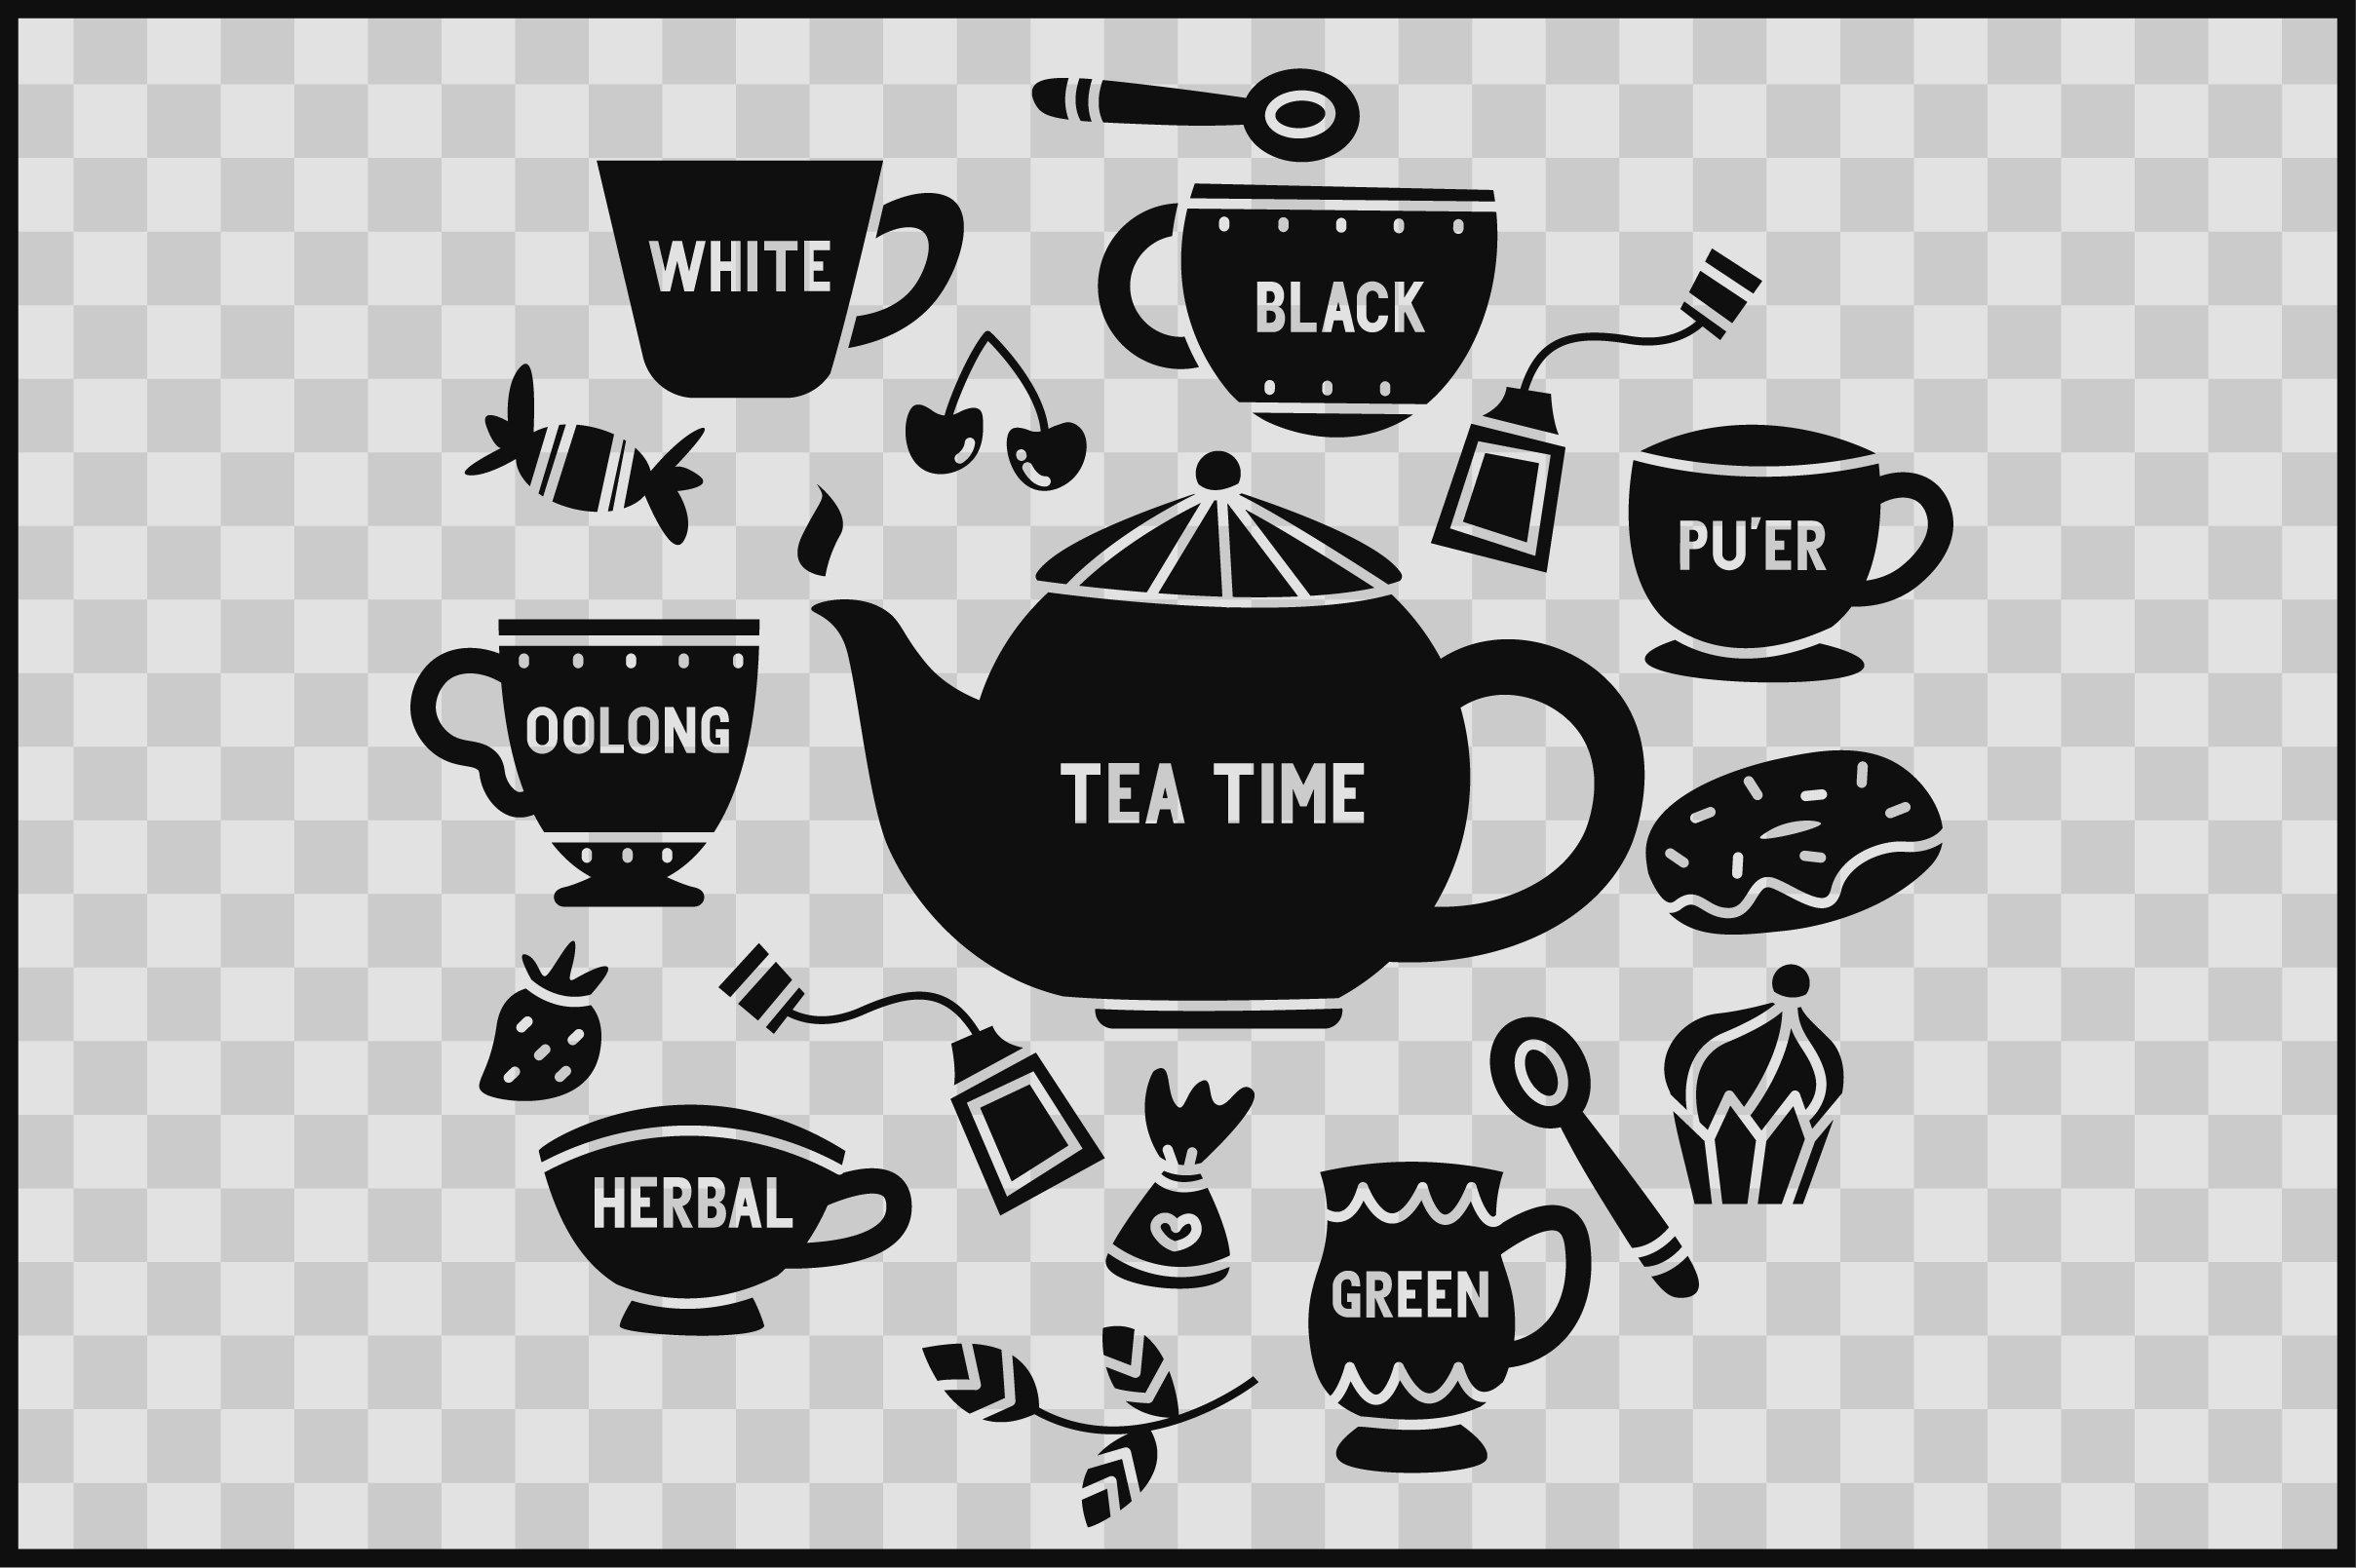 Download Tea Time 18 Tea Time Vector Elements Svg Cut Files 1120289 Cut Files Design Bundles